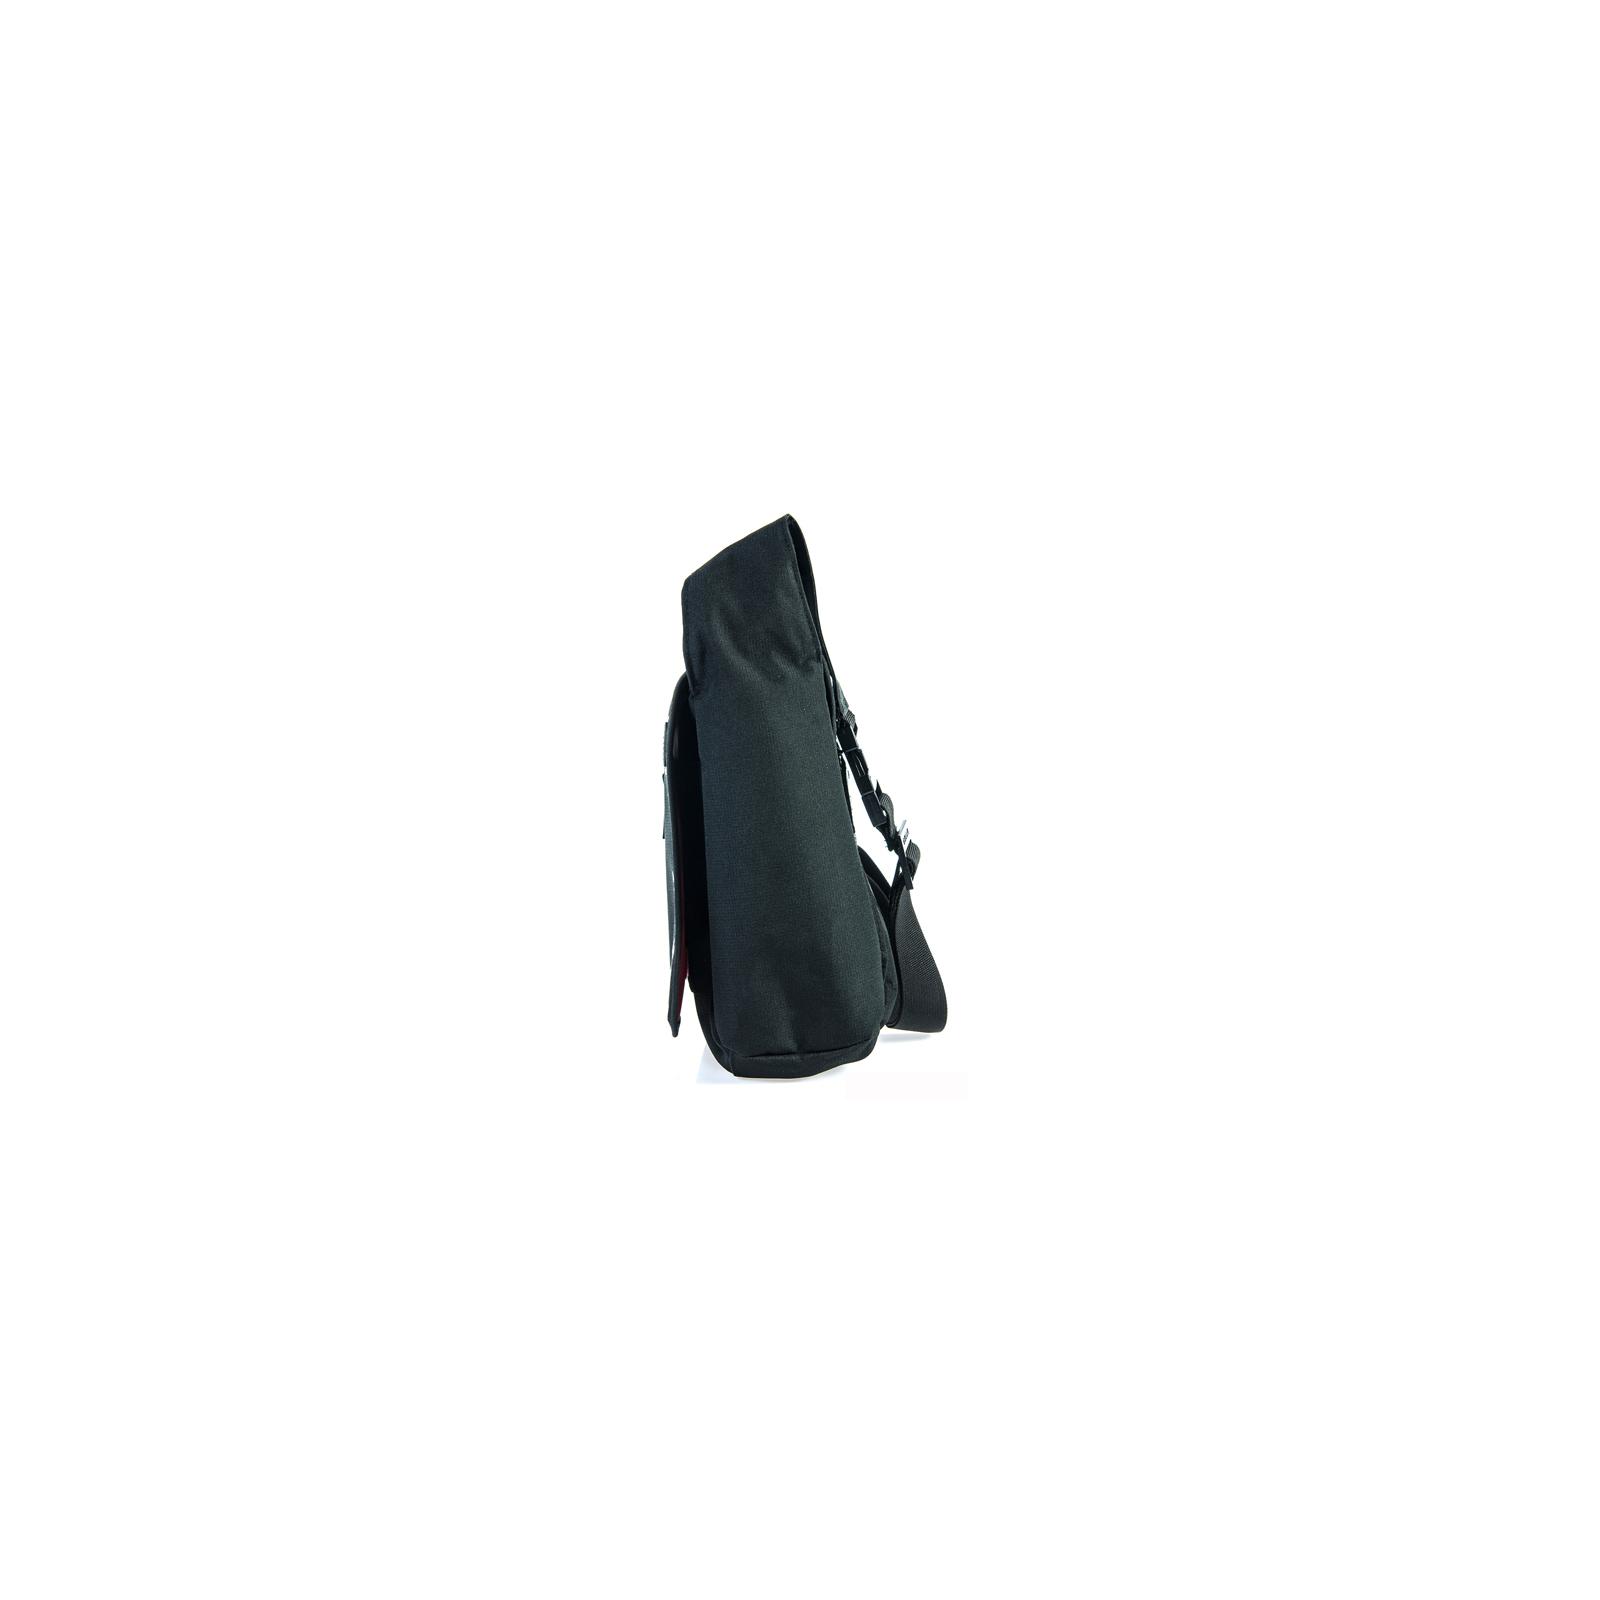 Фото-сумка Golla CAM BAG M black (G1265) изображение 2